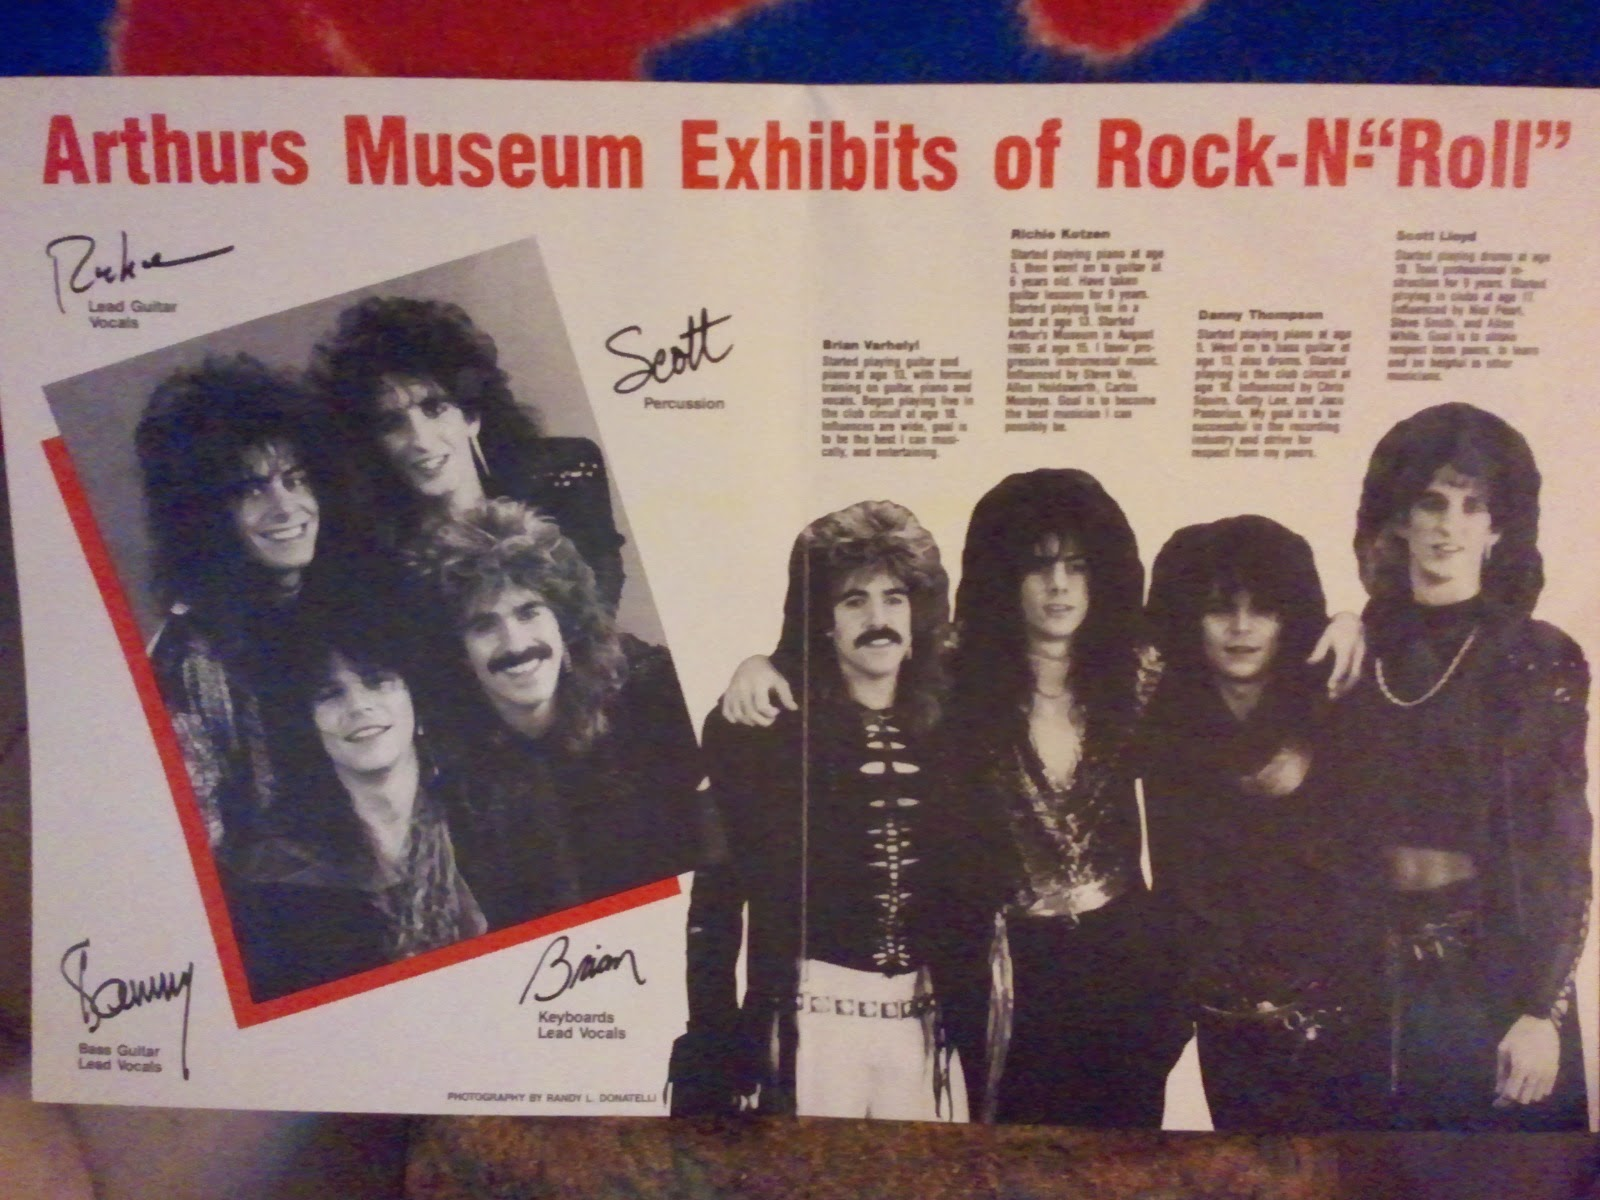 Arthurs museum Inside bio signed